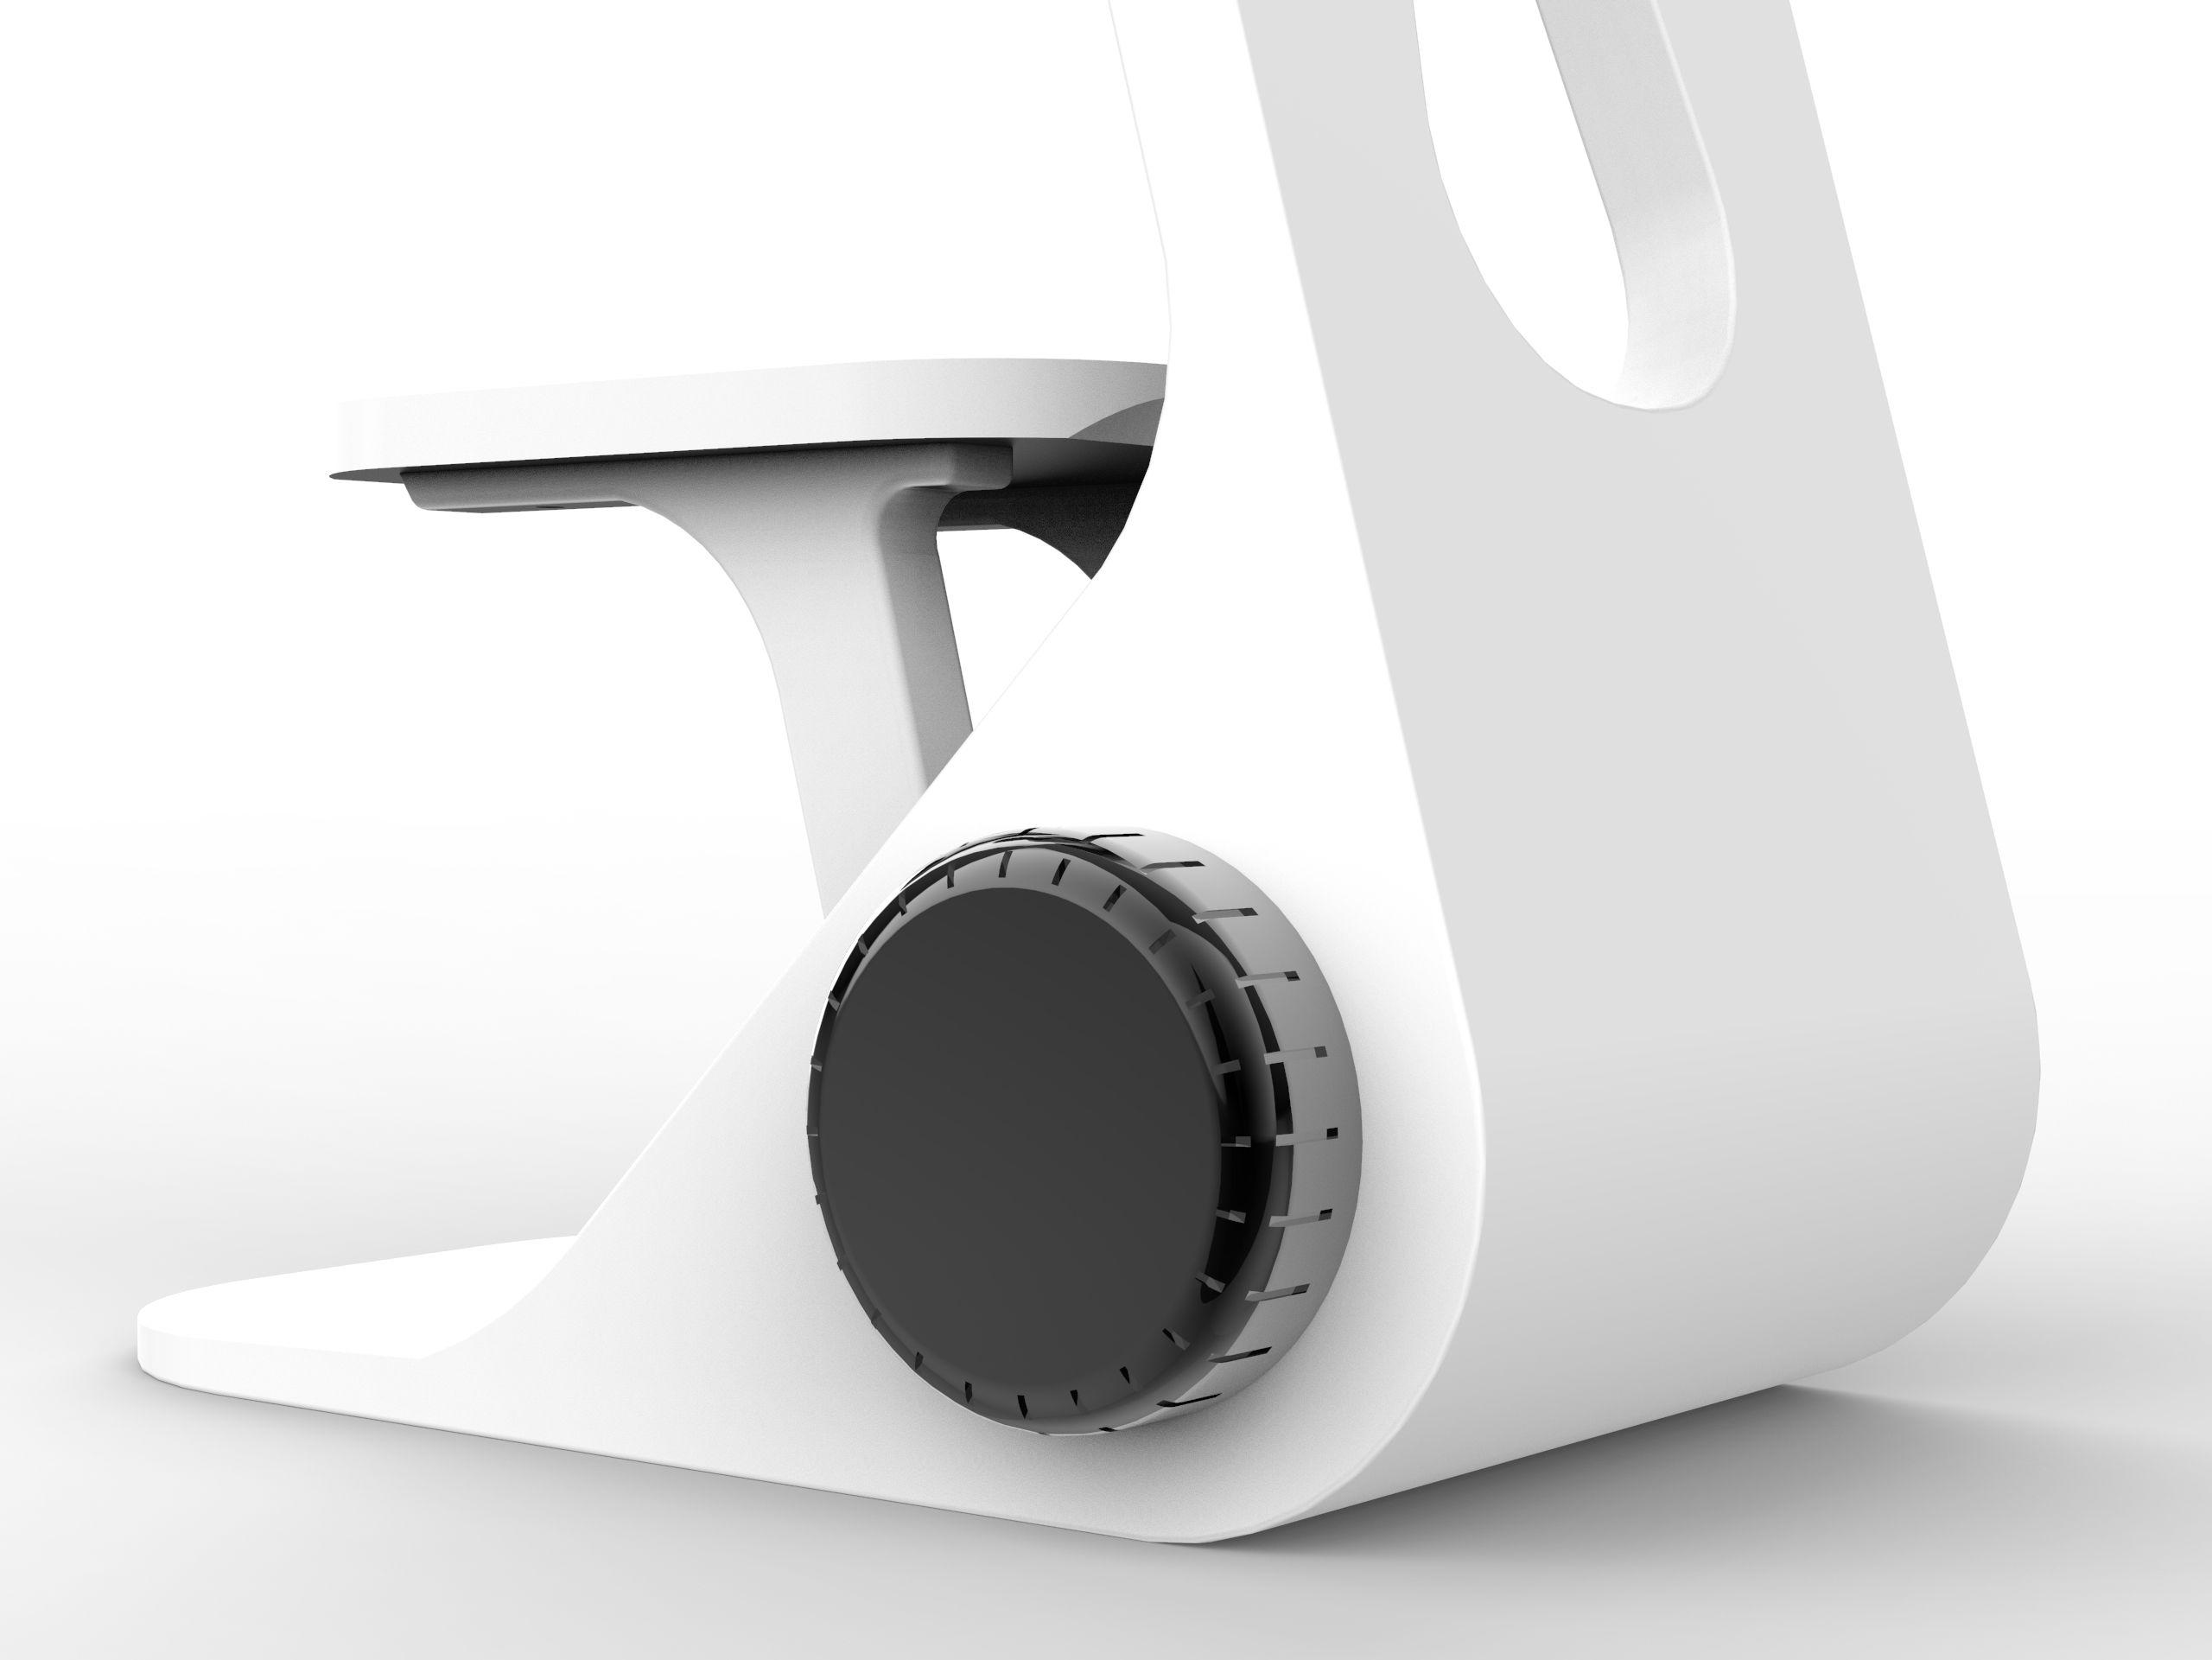 Electronic-microscope---rdt-3500-3500